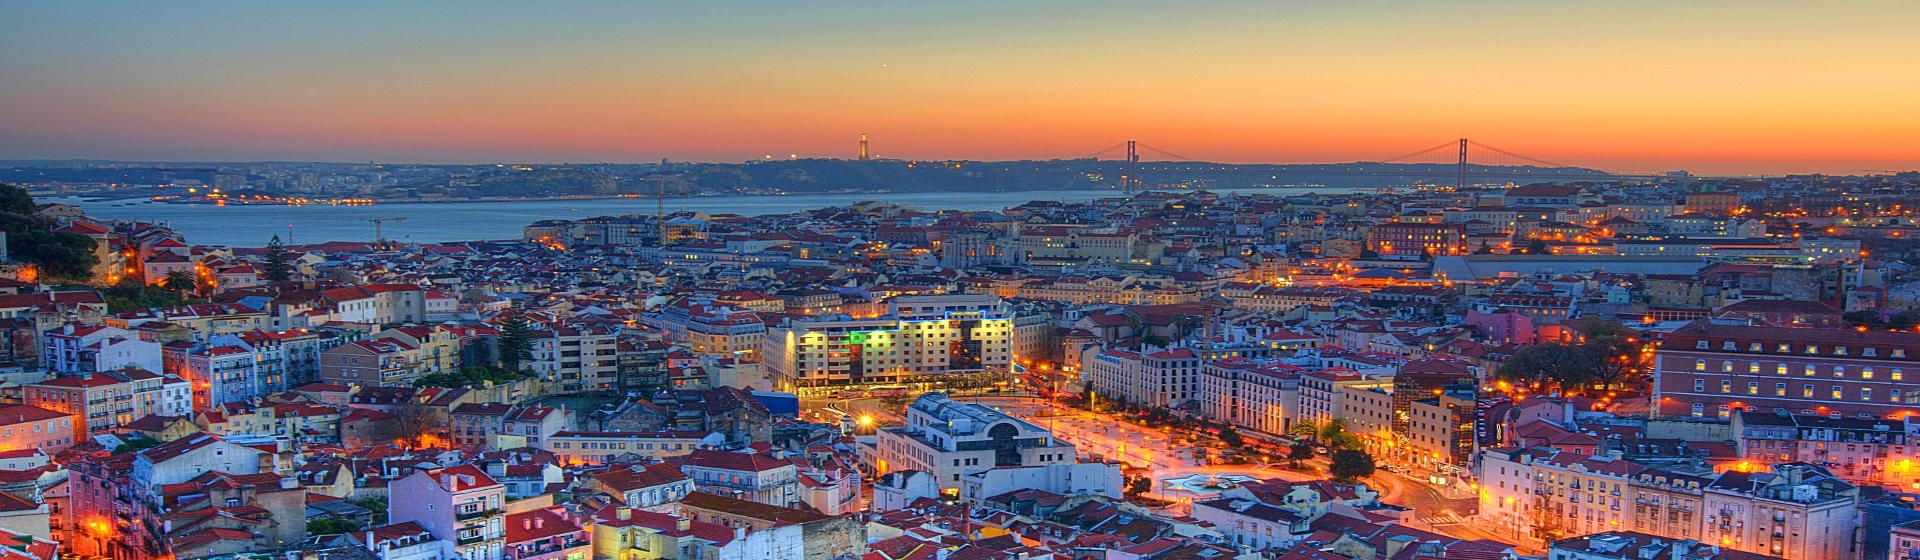 Despedida de soltero y soltera en Lisboa. Viaje a Lisboa, Portugal.